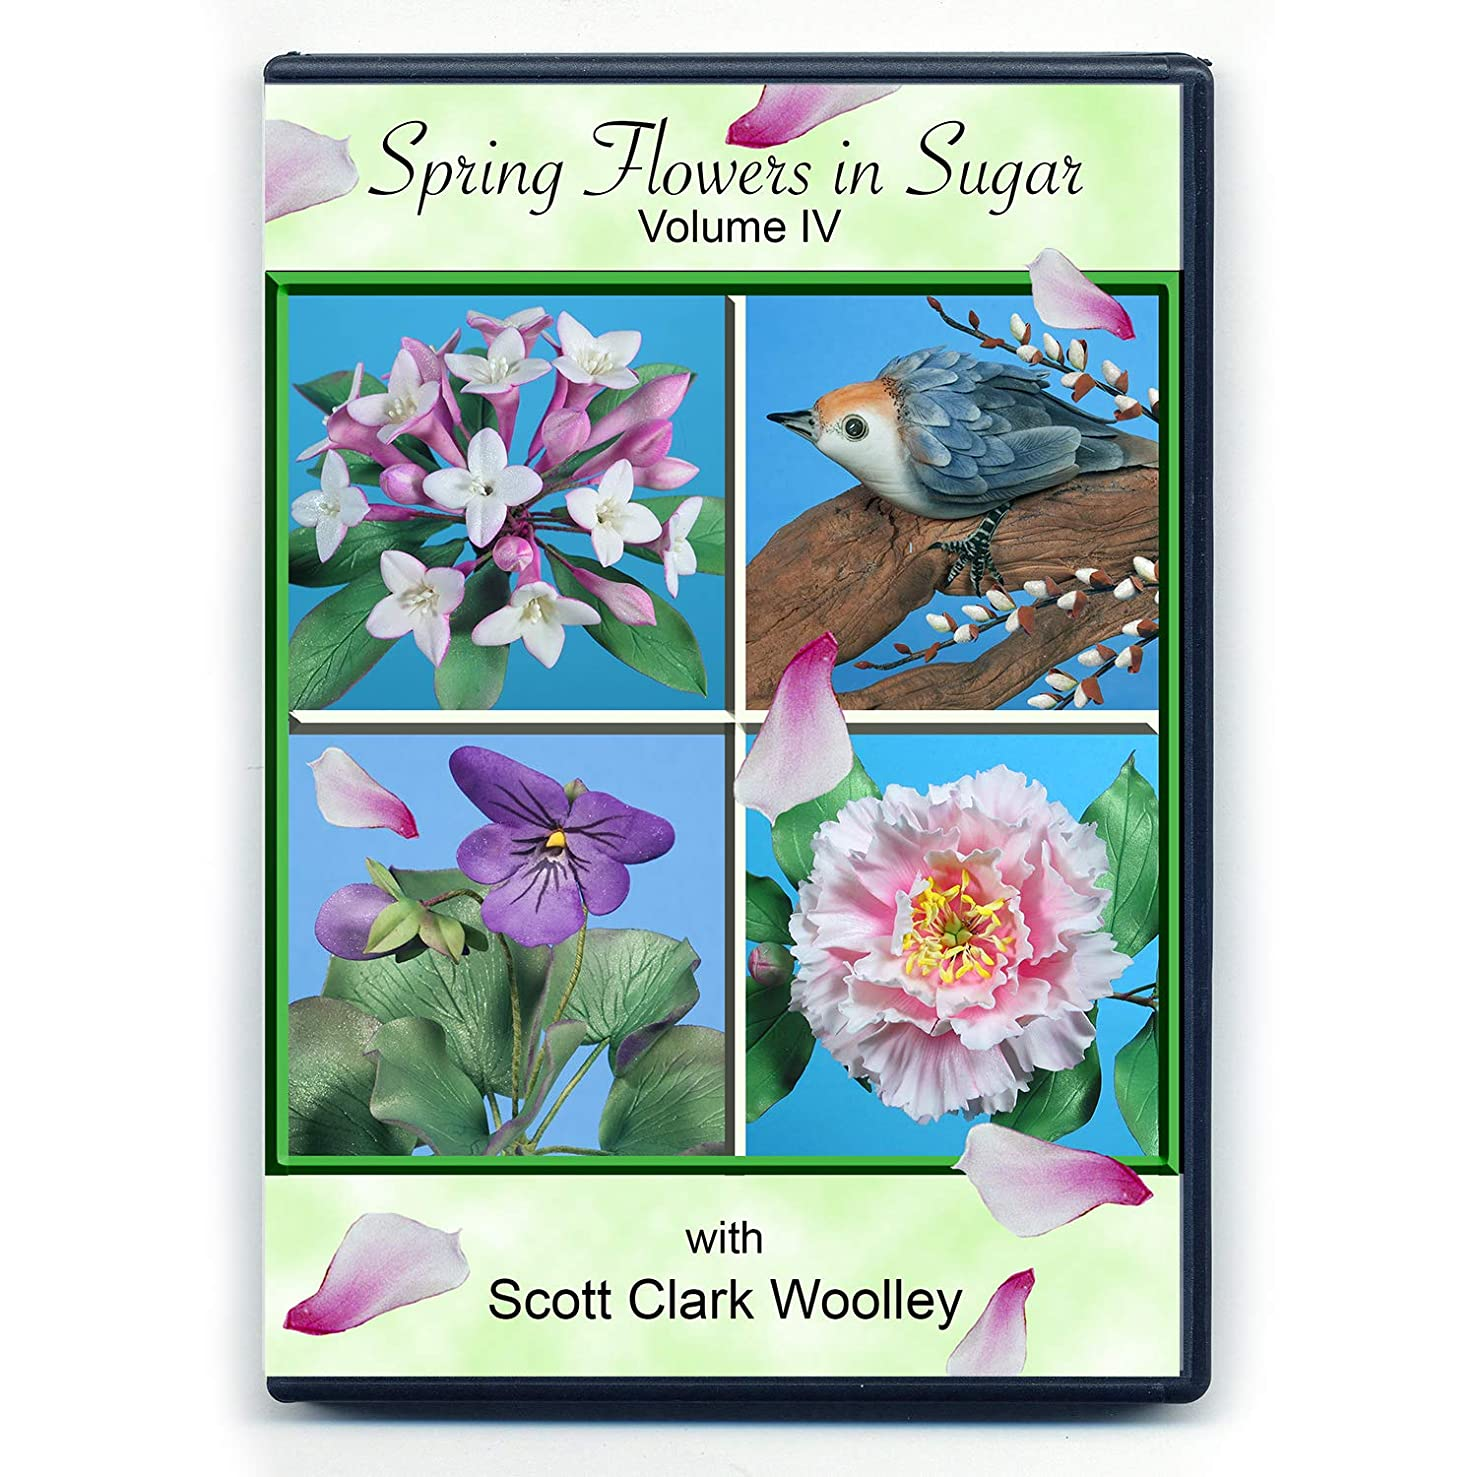 Spring Flowers in Sugar (Volume IV) with Scott Clark Woolley (NTSC DVD Format)